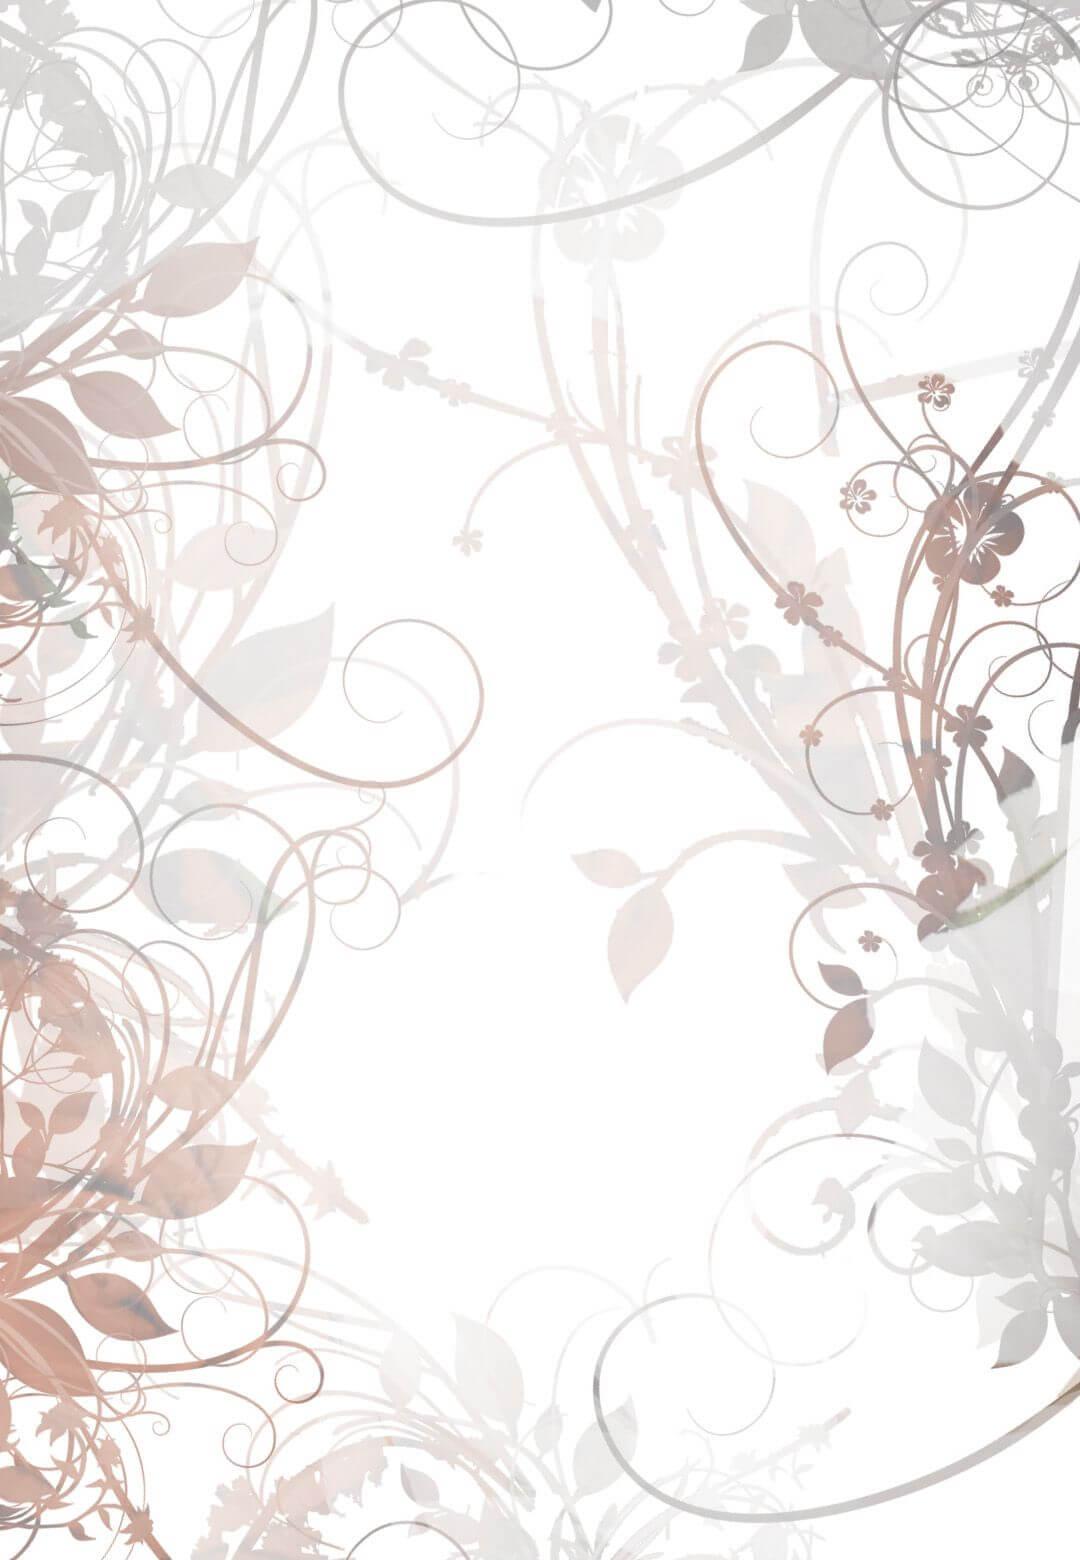 Free Printable Floral Bridal Shower Invitation | Possible Throughout Blank Bridal Shower Invitations Templates